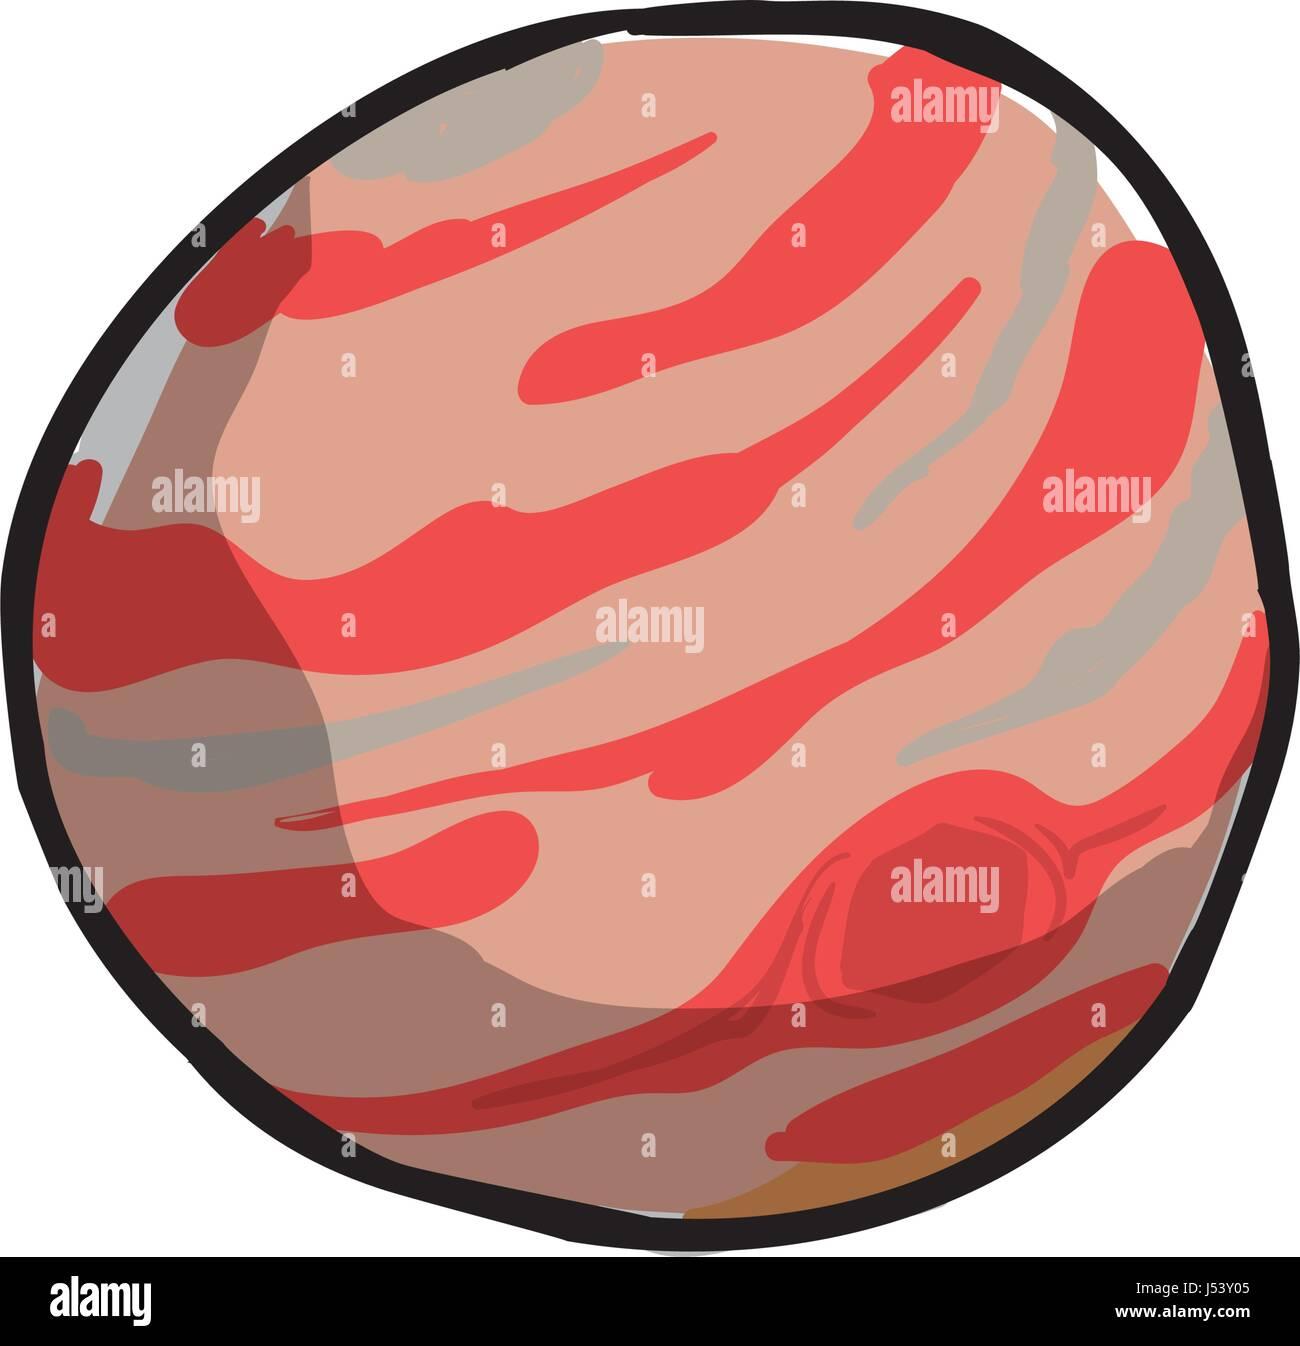 jupiter planet cartoon - Stock Image